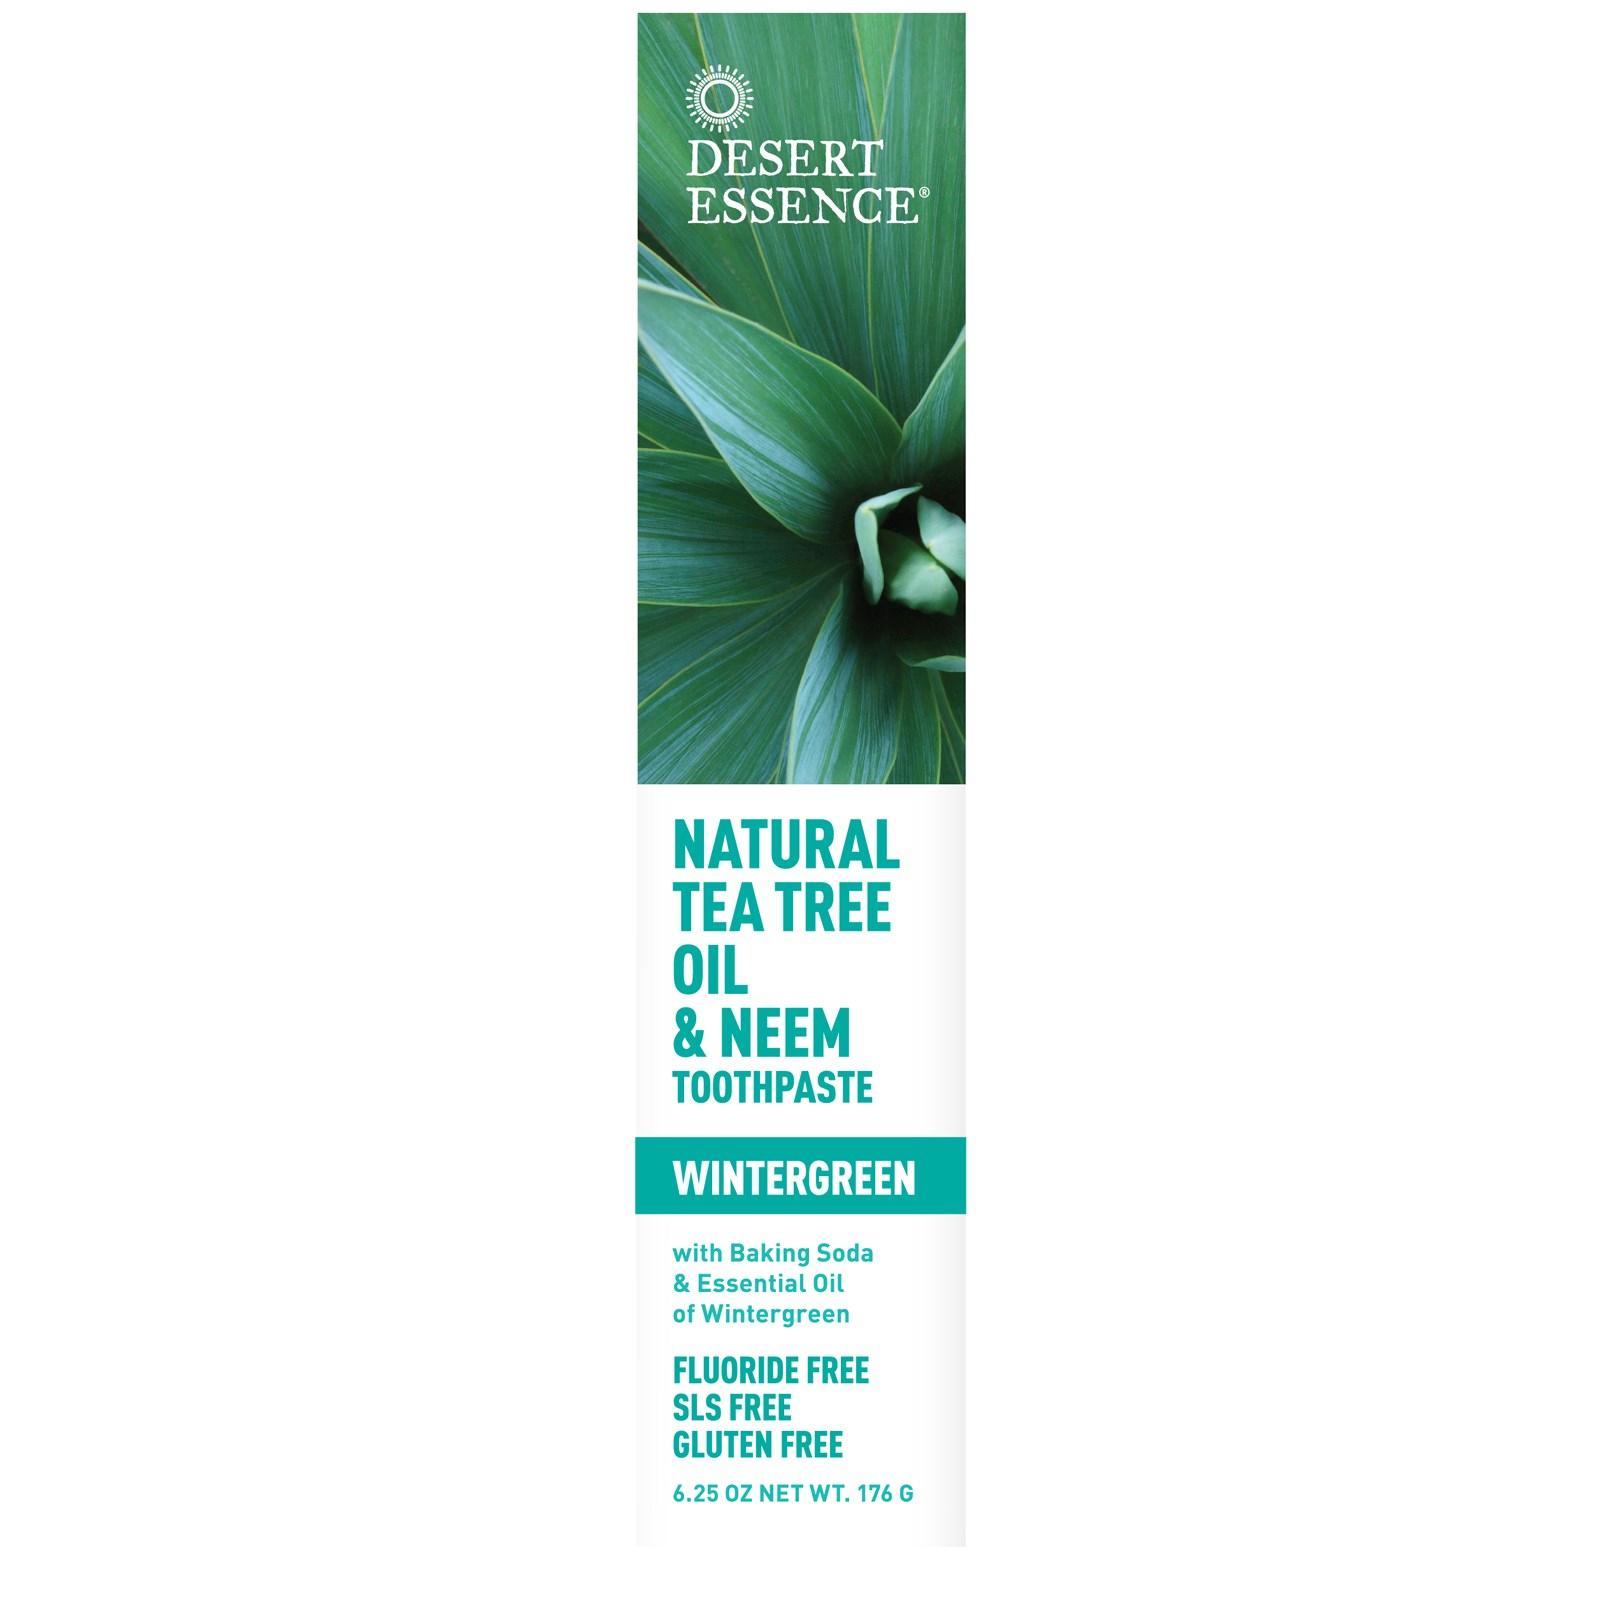 Desert Essence Tea Tree Oil & Neem Toothpaste Wintergreen...